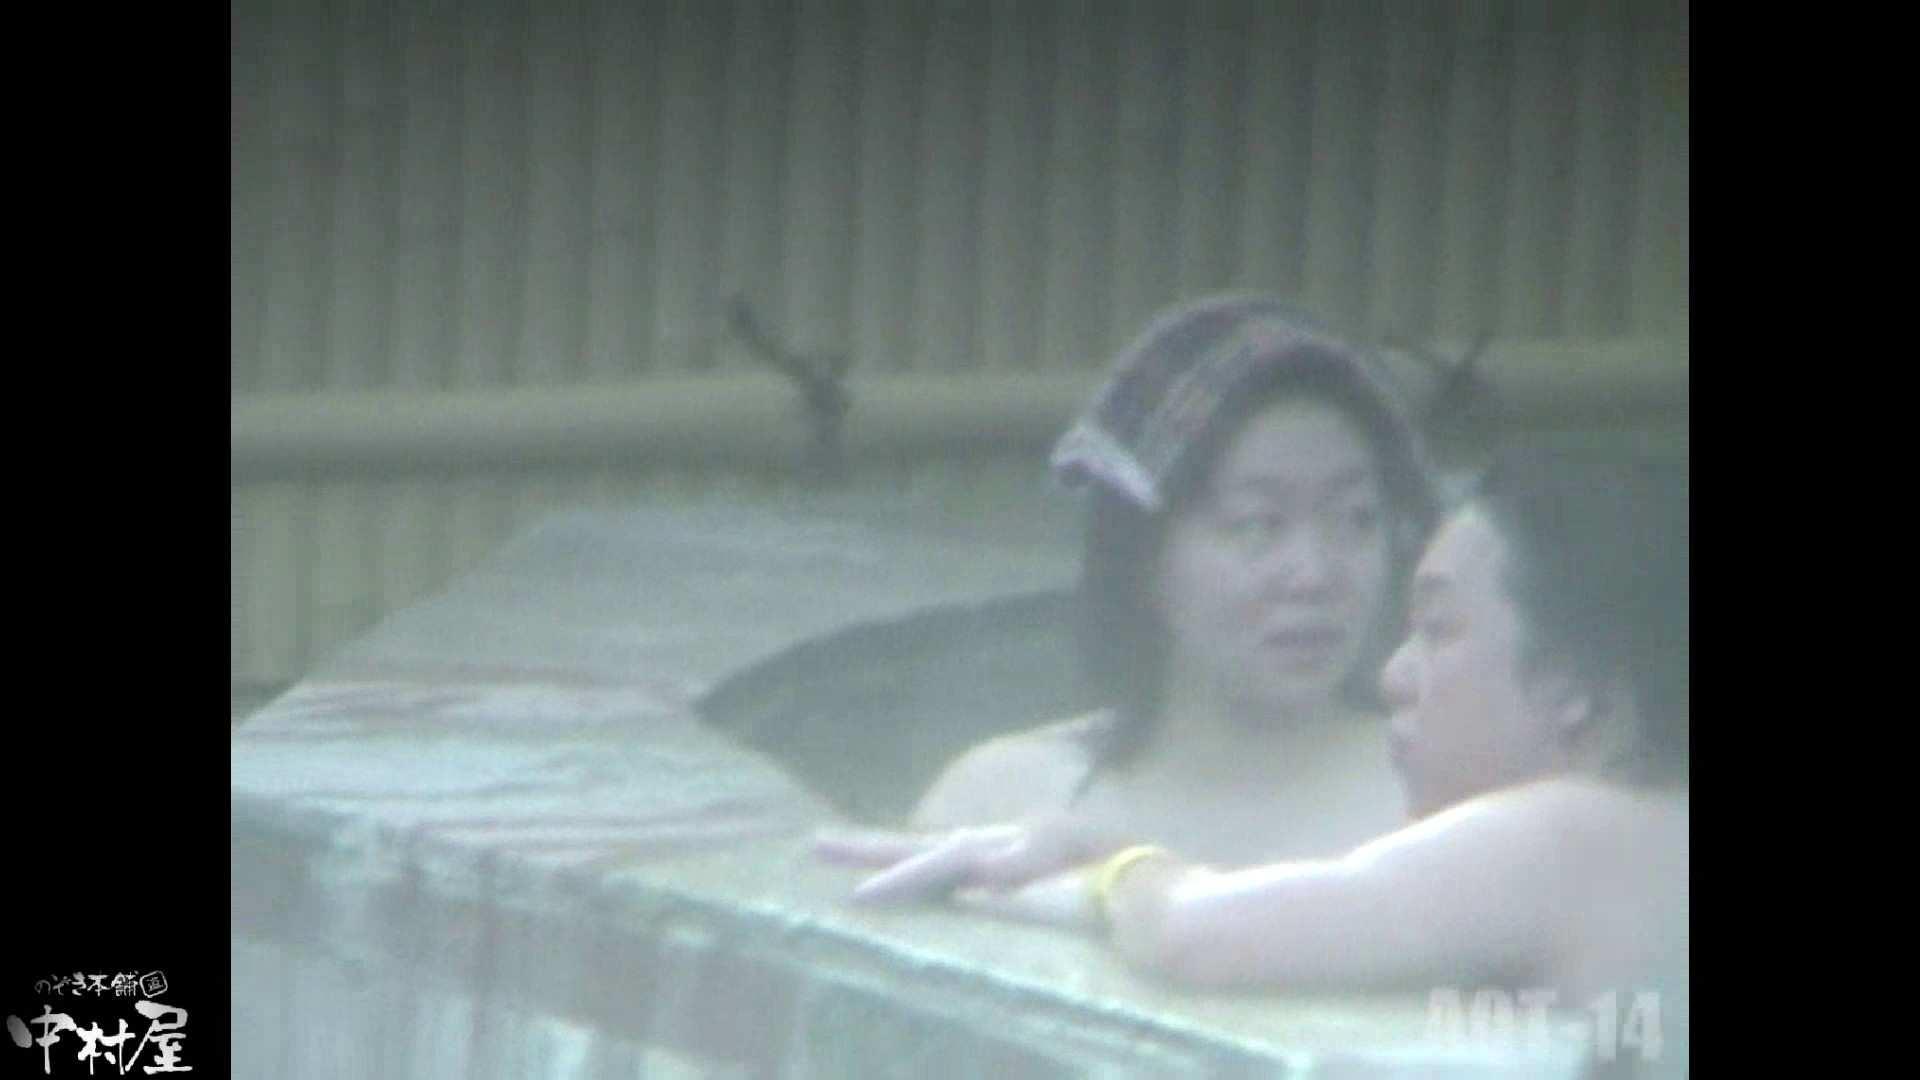 Aquaな露天風呂Vol.878潜入盗撮露天風呂十四判湯 其の十一 盗撮師作品 のぞき動画画像 94pic 86